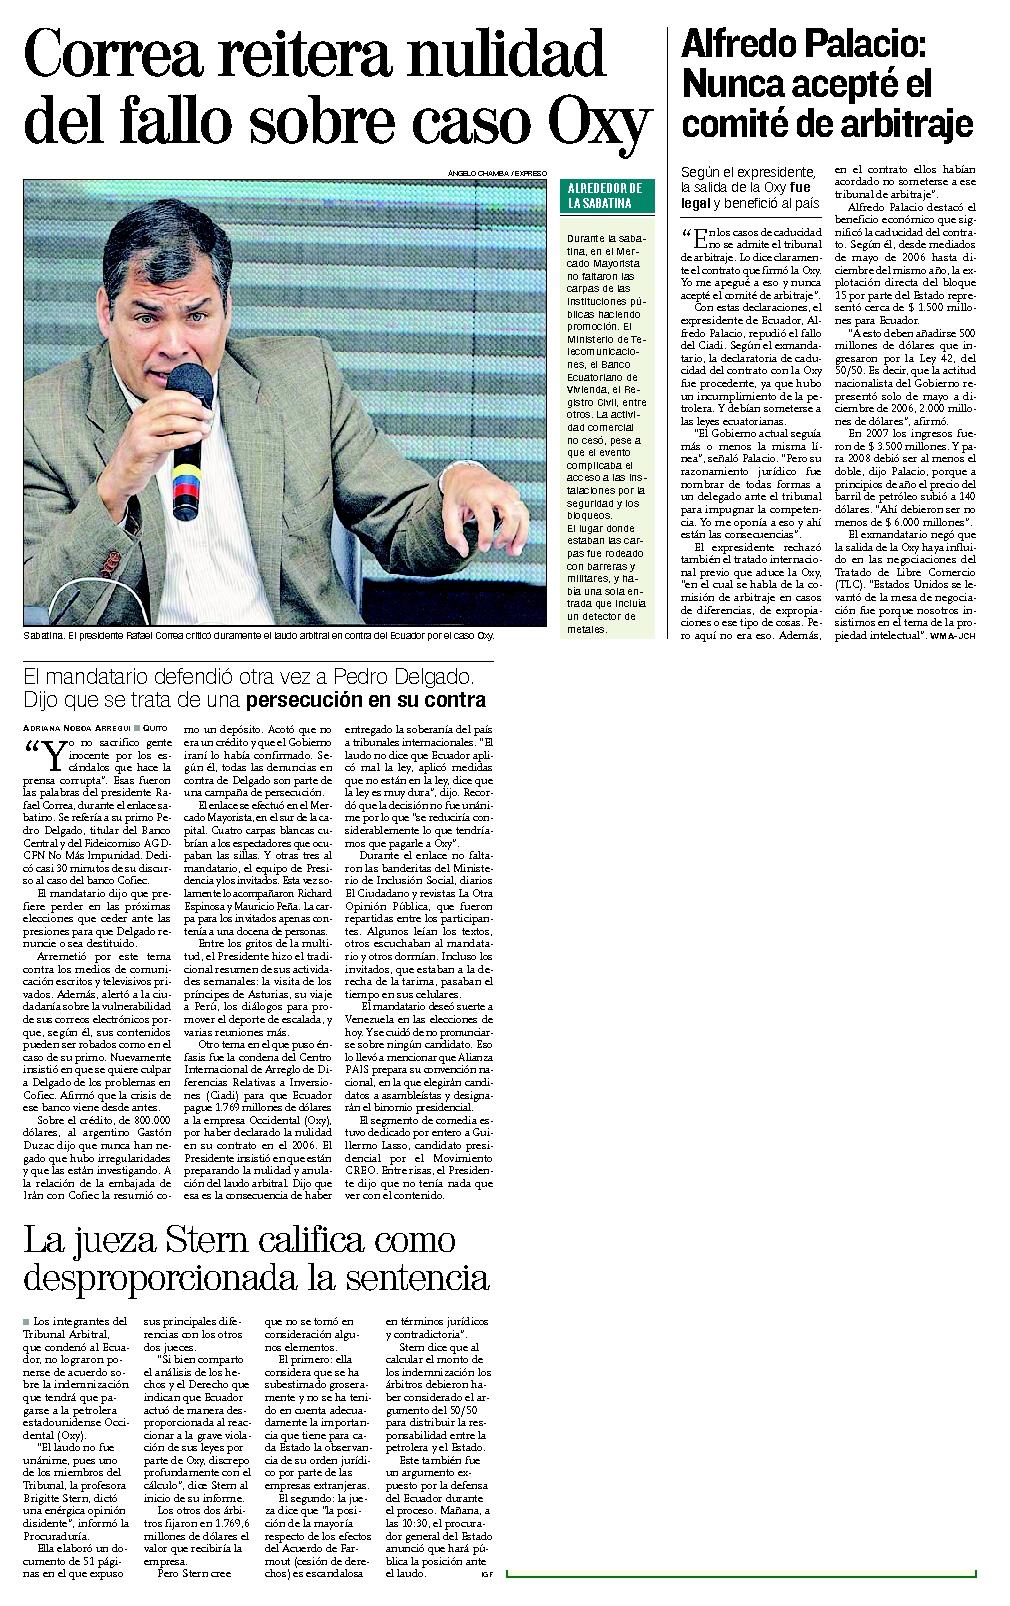 74-Expreso, Correa reitera nulidad del fallo sobre caso Oxy 07 10